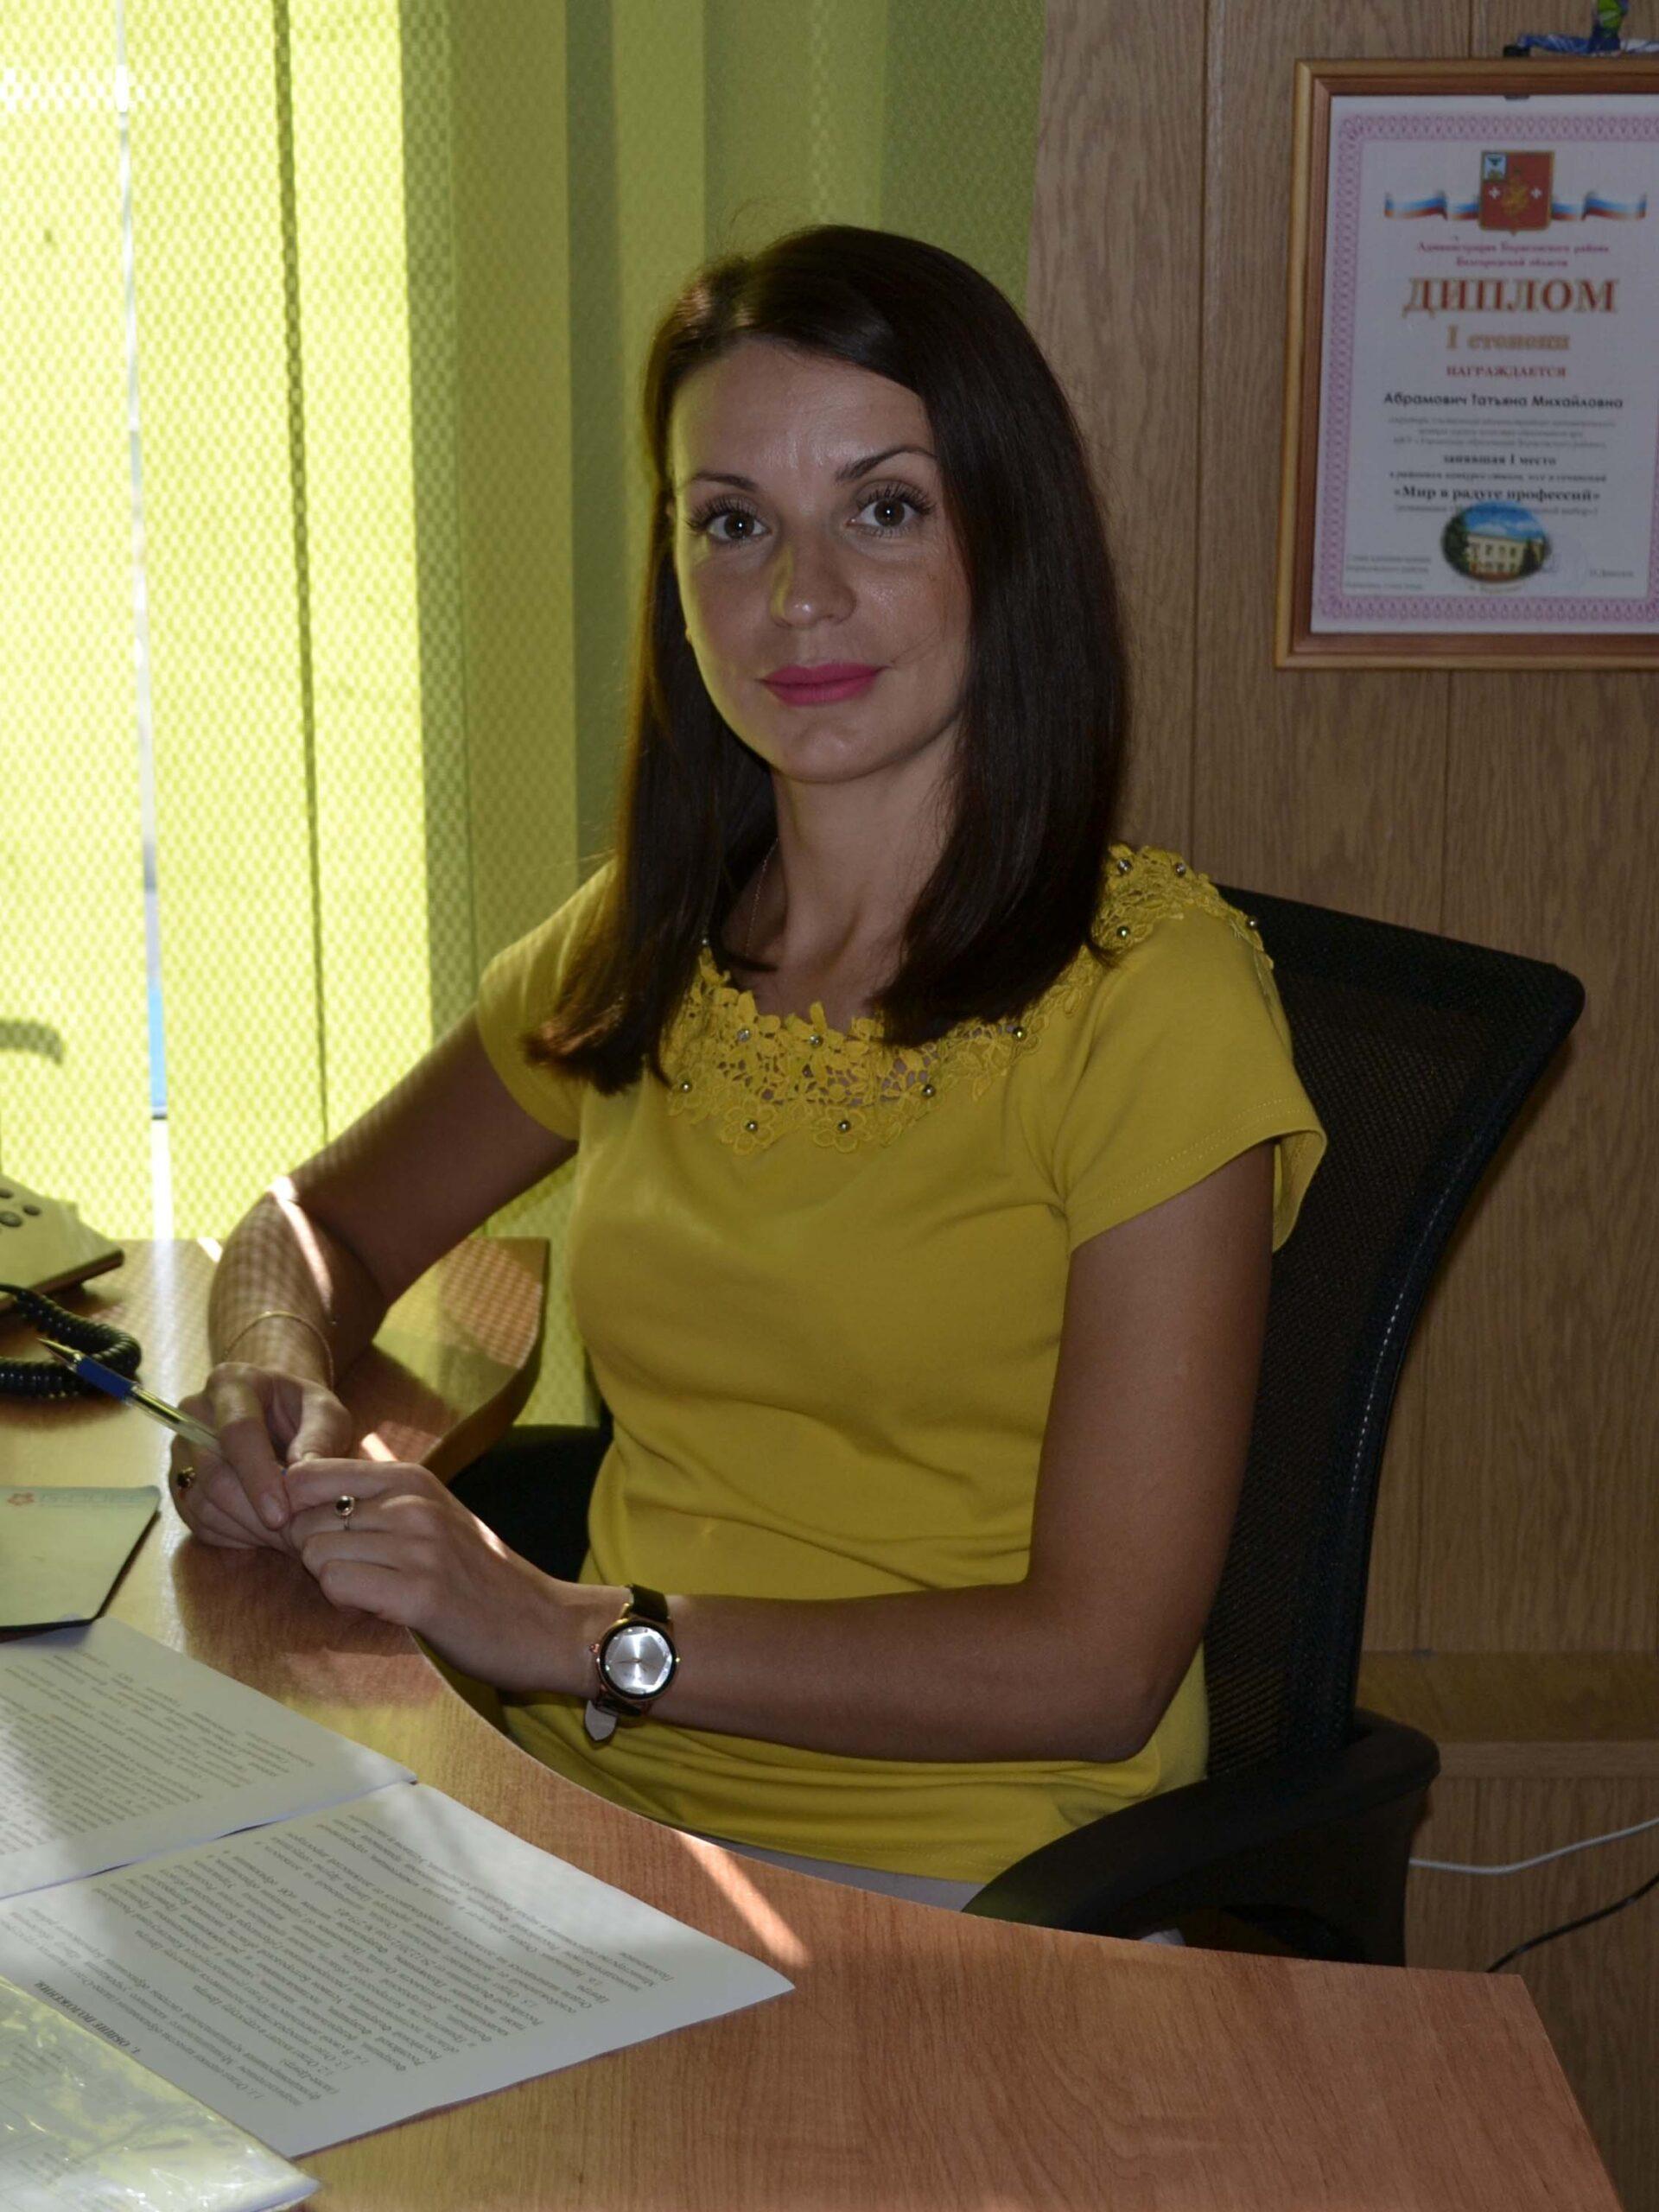 Абрамович Татьяна Михайловна